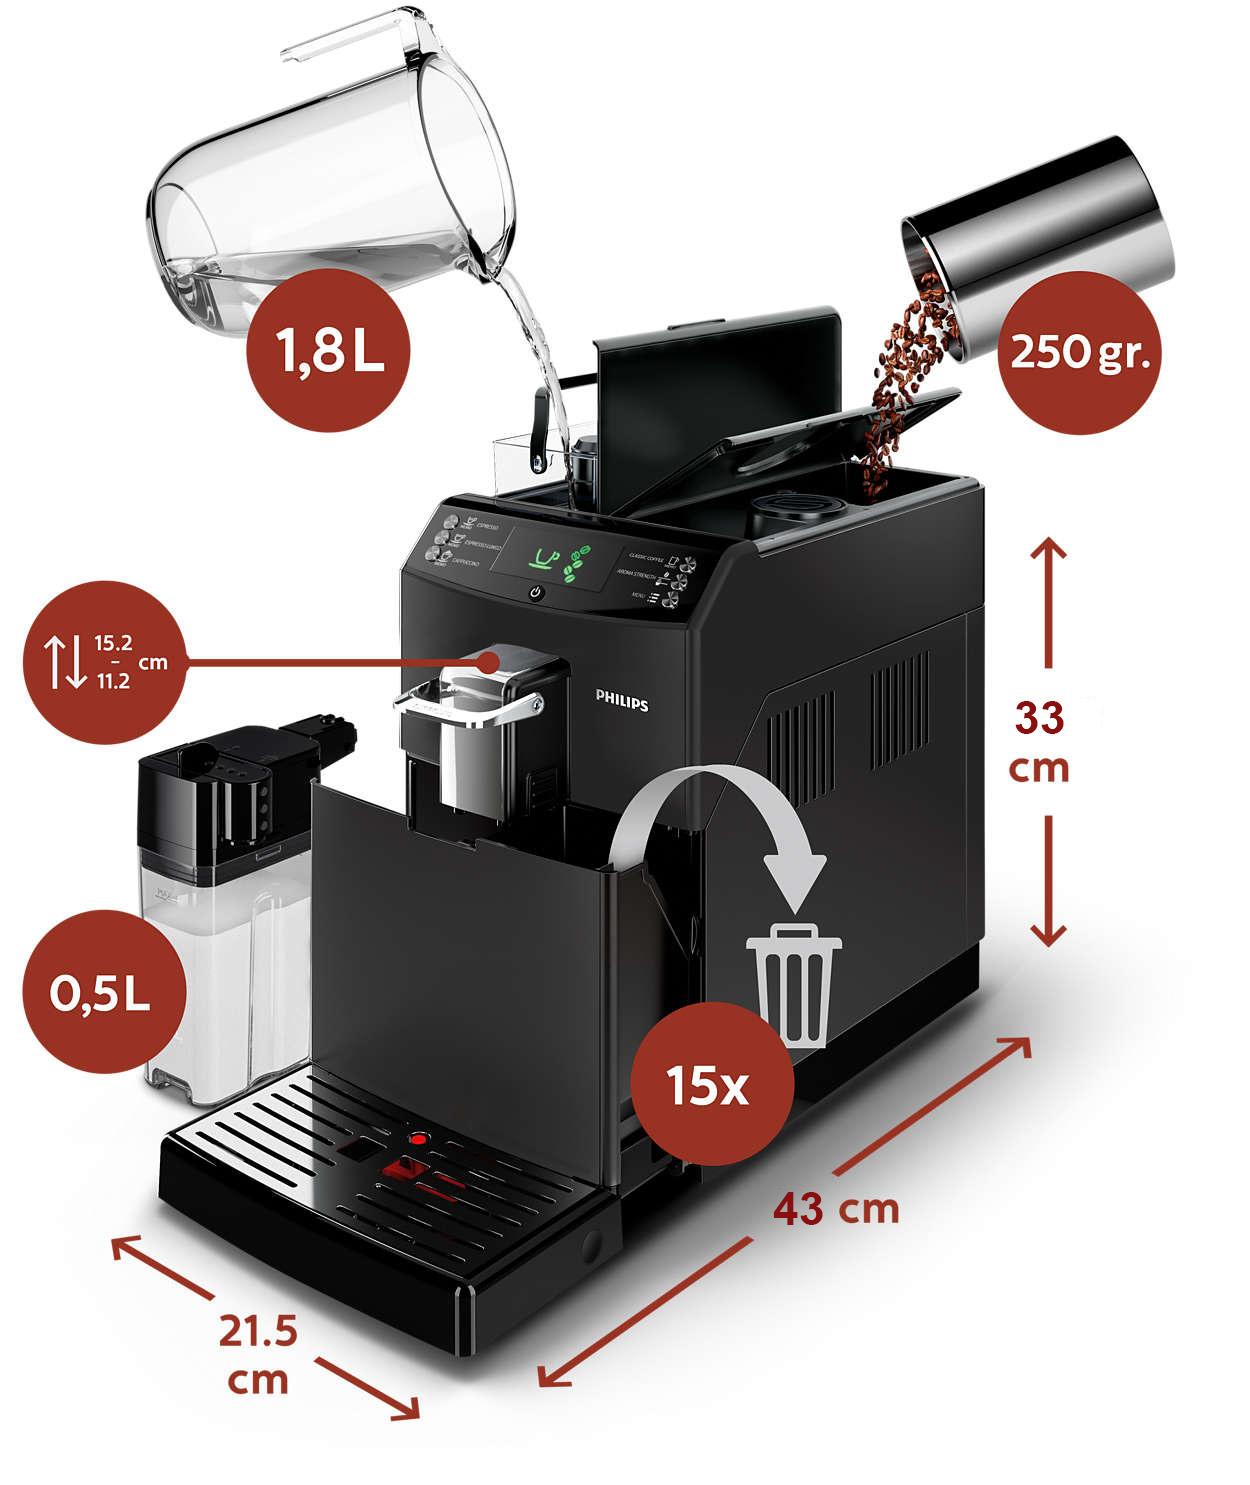 Технические характеристики кофемашины Philips HD8848